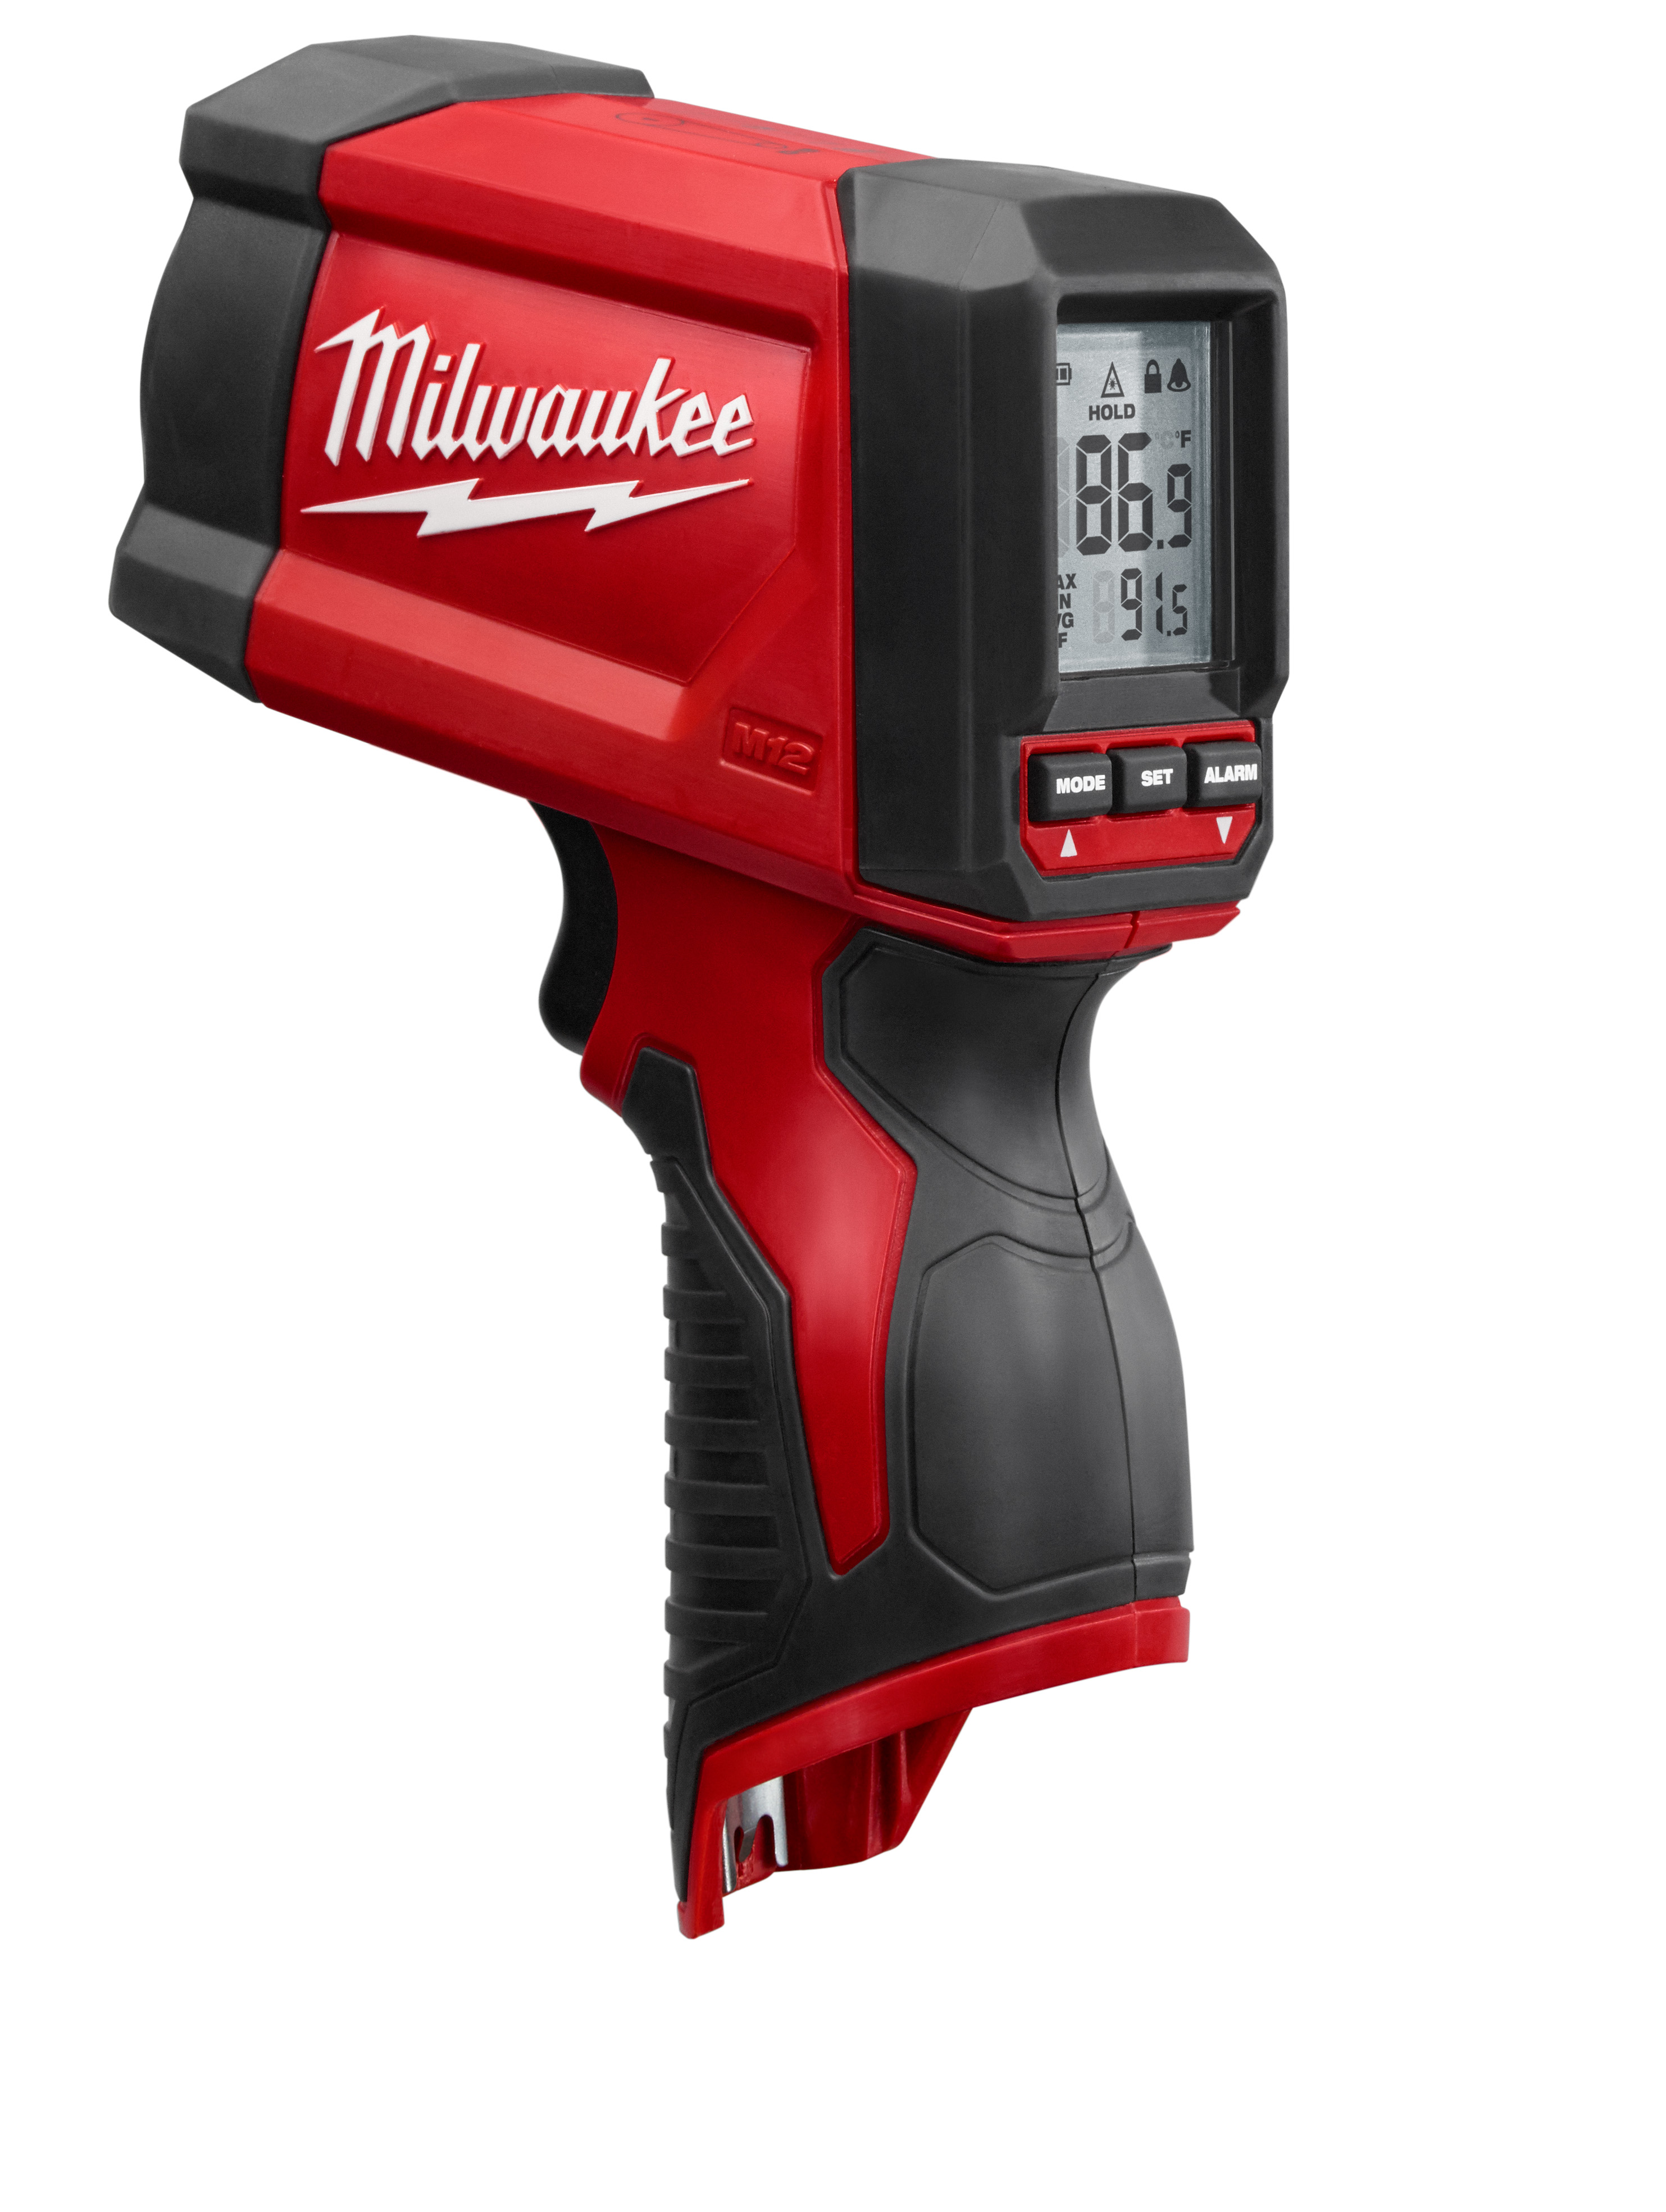 Milwaukee 2278-20 M12™ 12:1 Infrared Temp-Gun